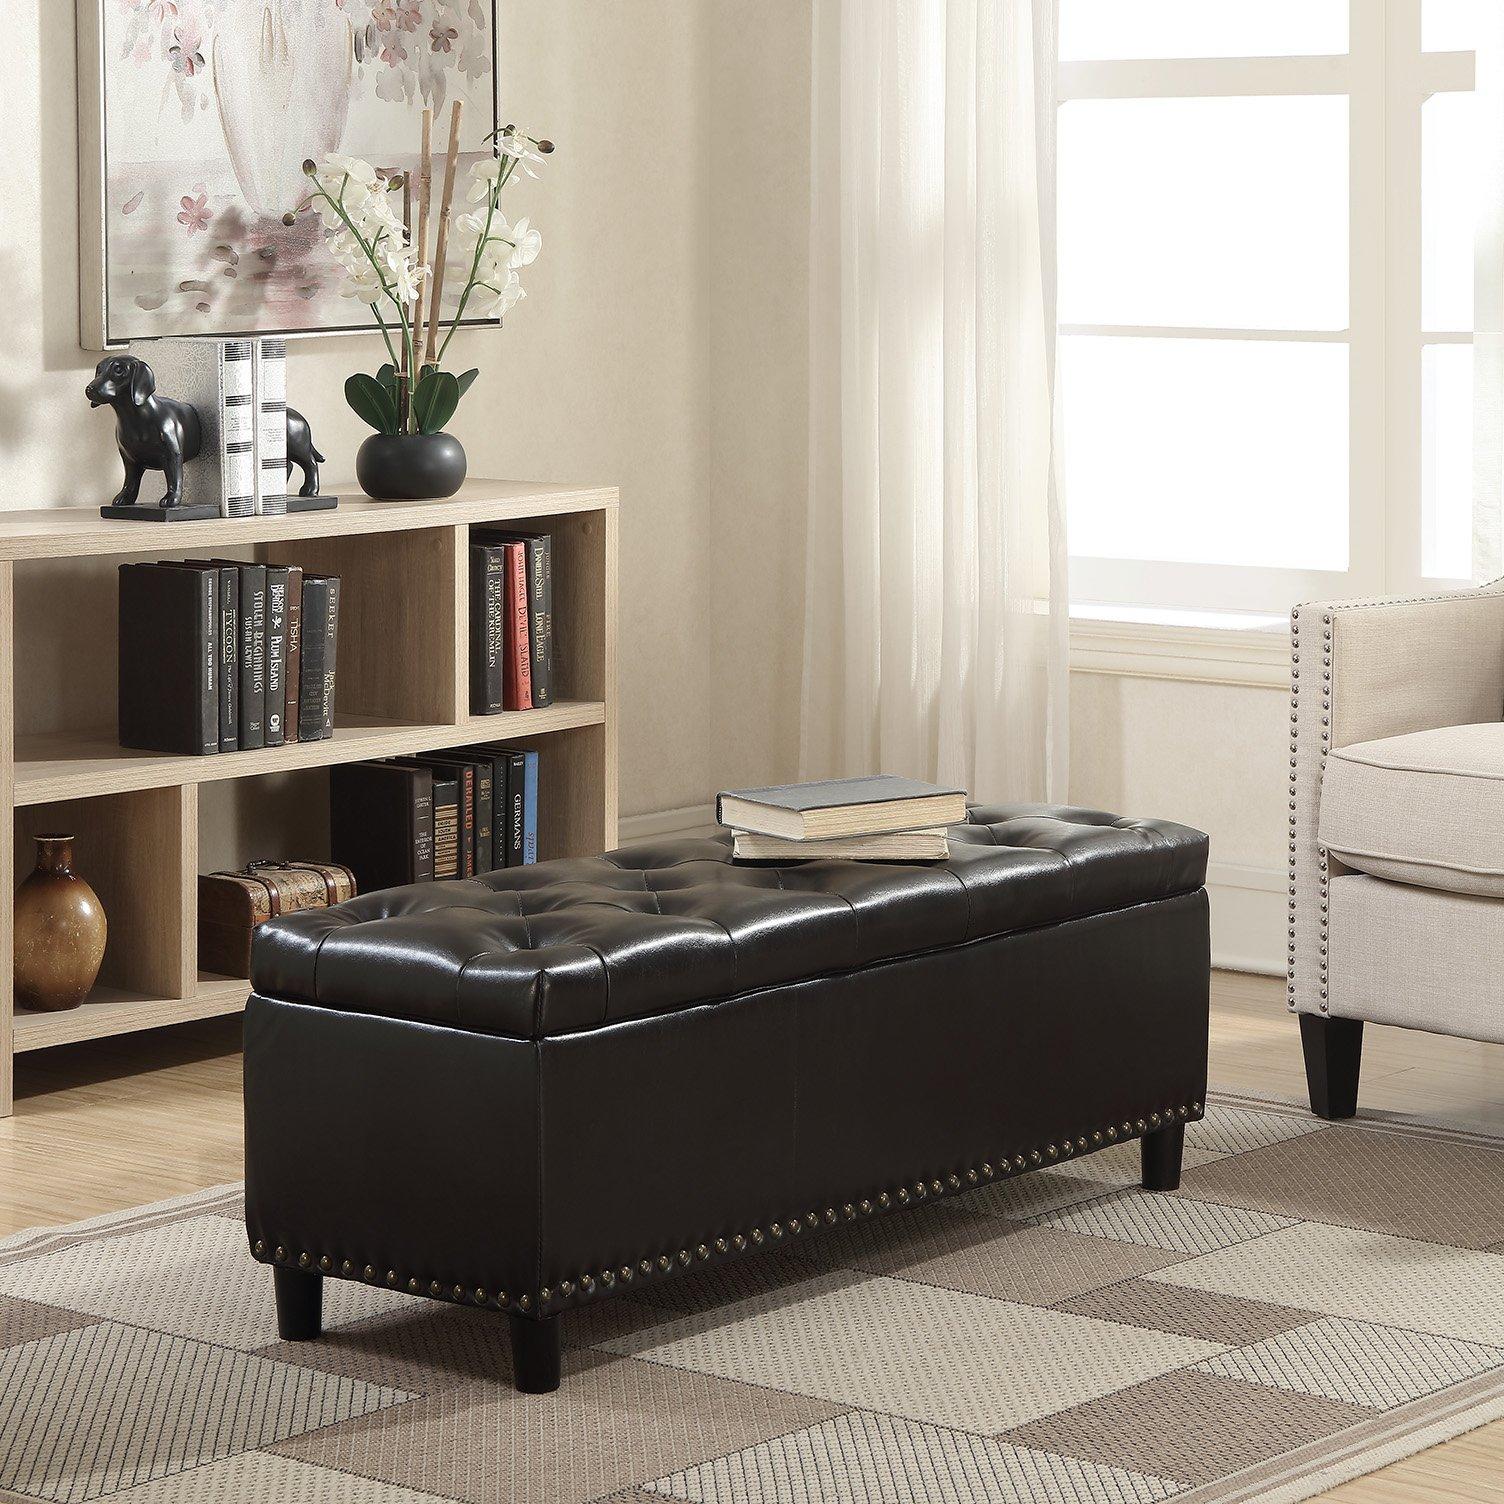 Belleze 48'' Rectangular Faux Leather Storage Ottoman Bench Footrest, Large, Brown by Belleze